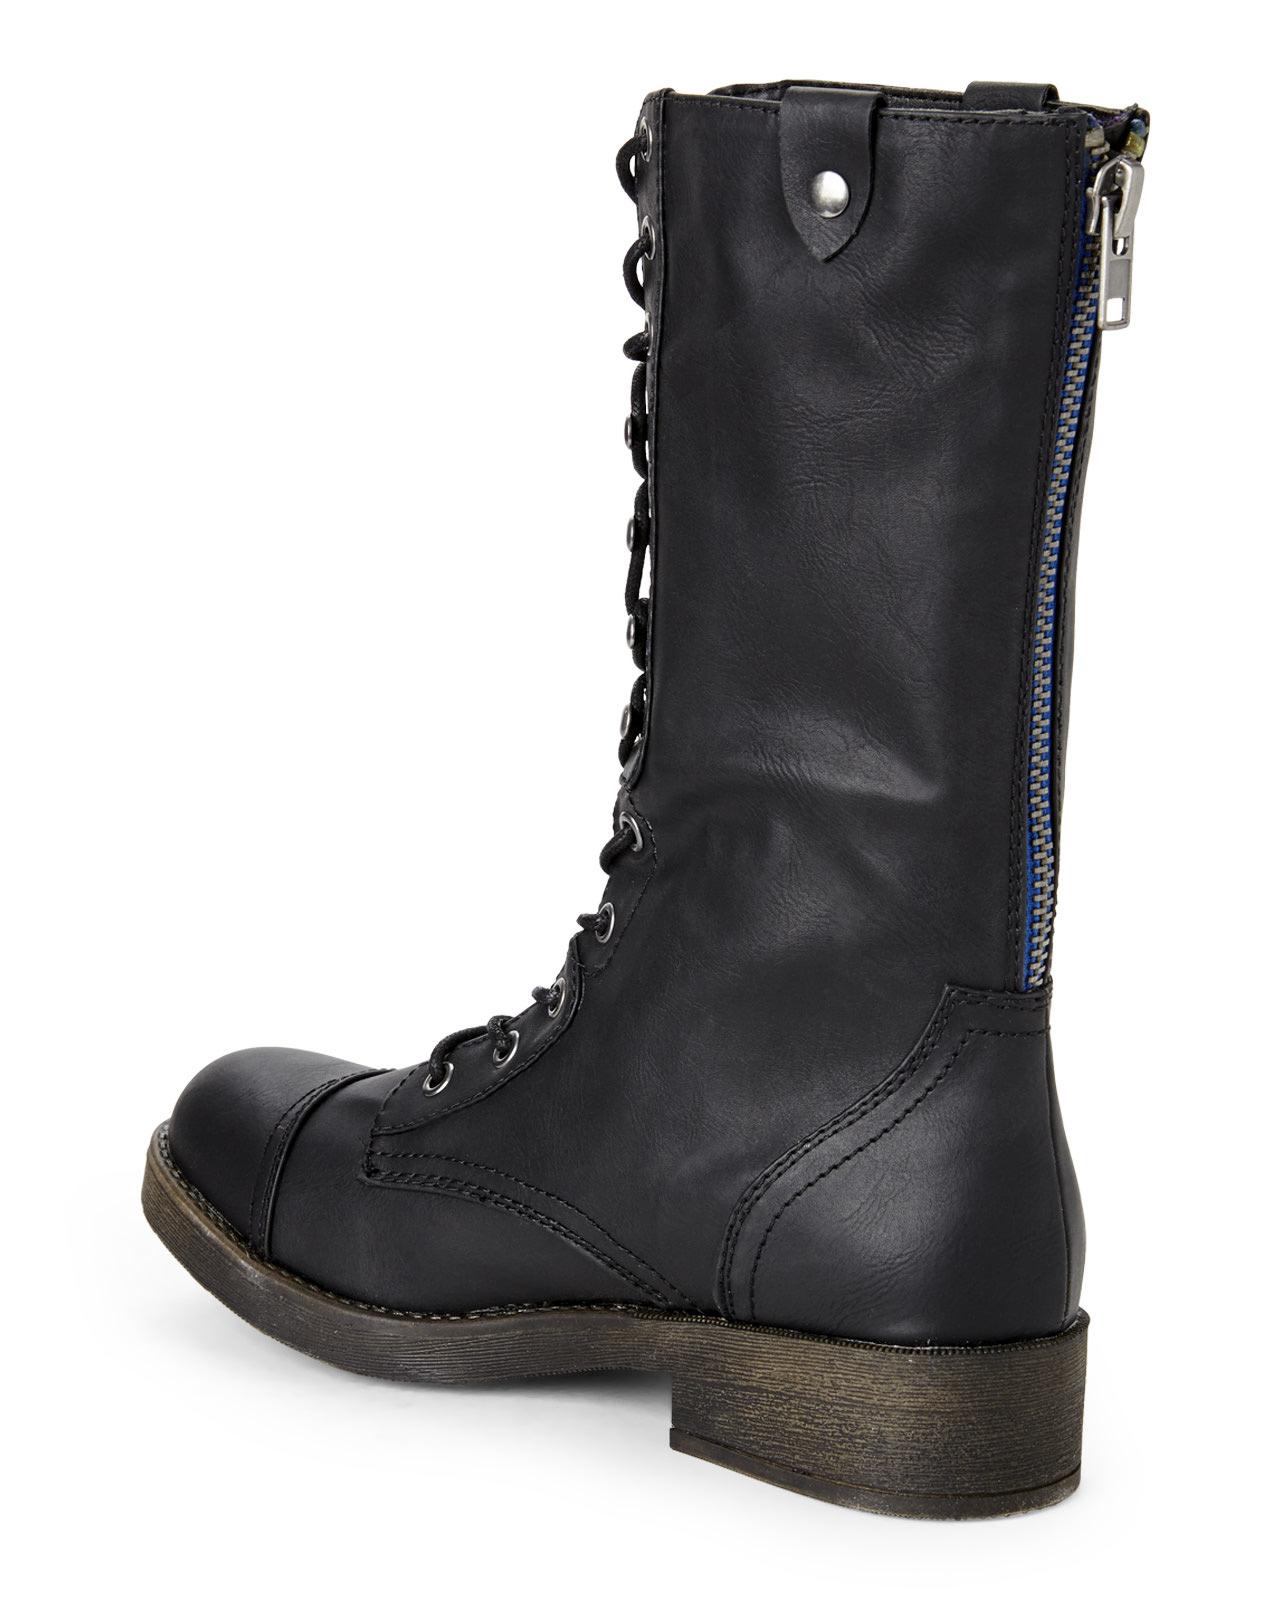 Madden girl Black Motorrr Fold-Down Combat Boots in Black | Lyst